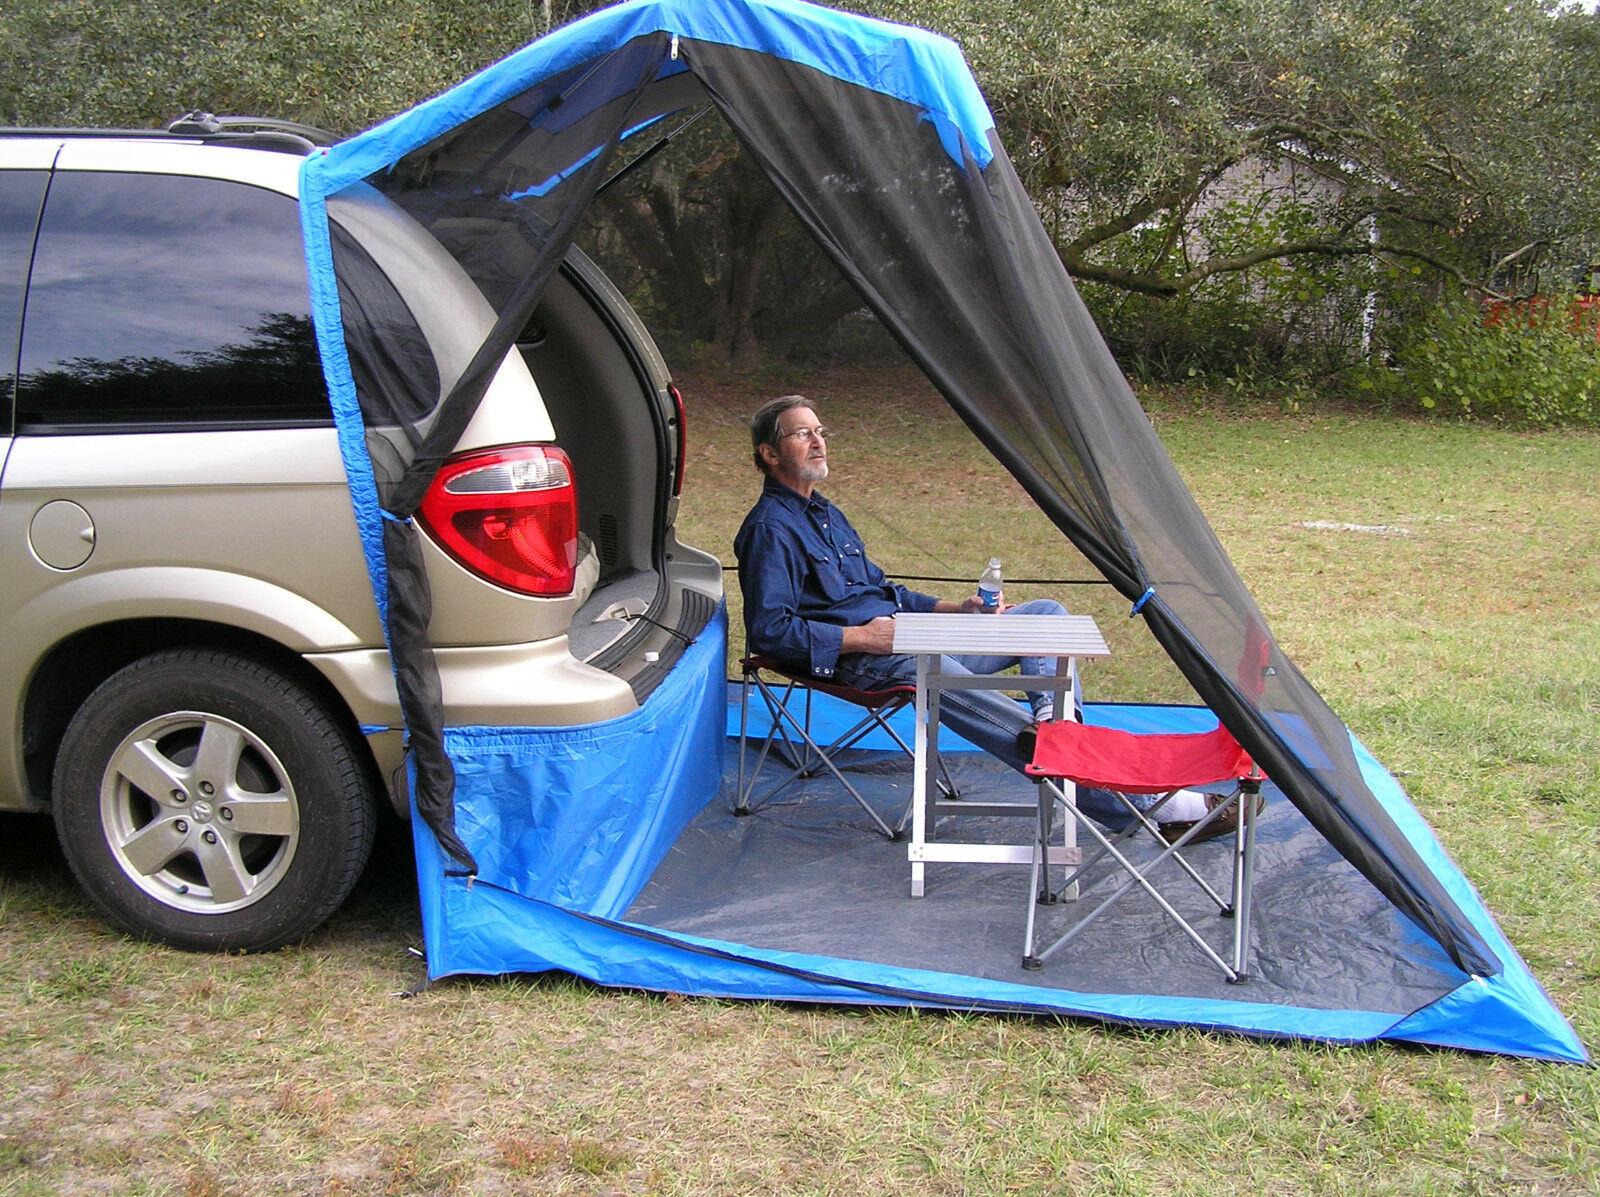 тент на багажник автомобиля для отдыха на природе